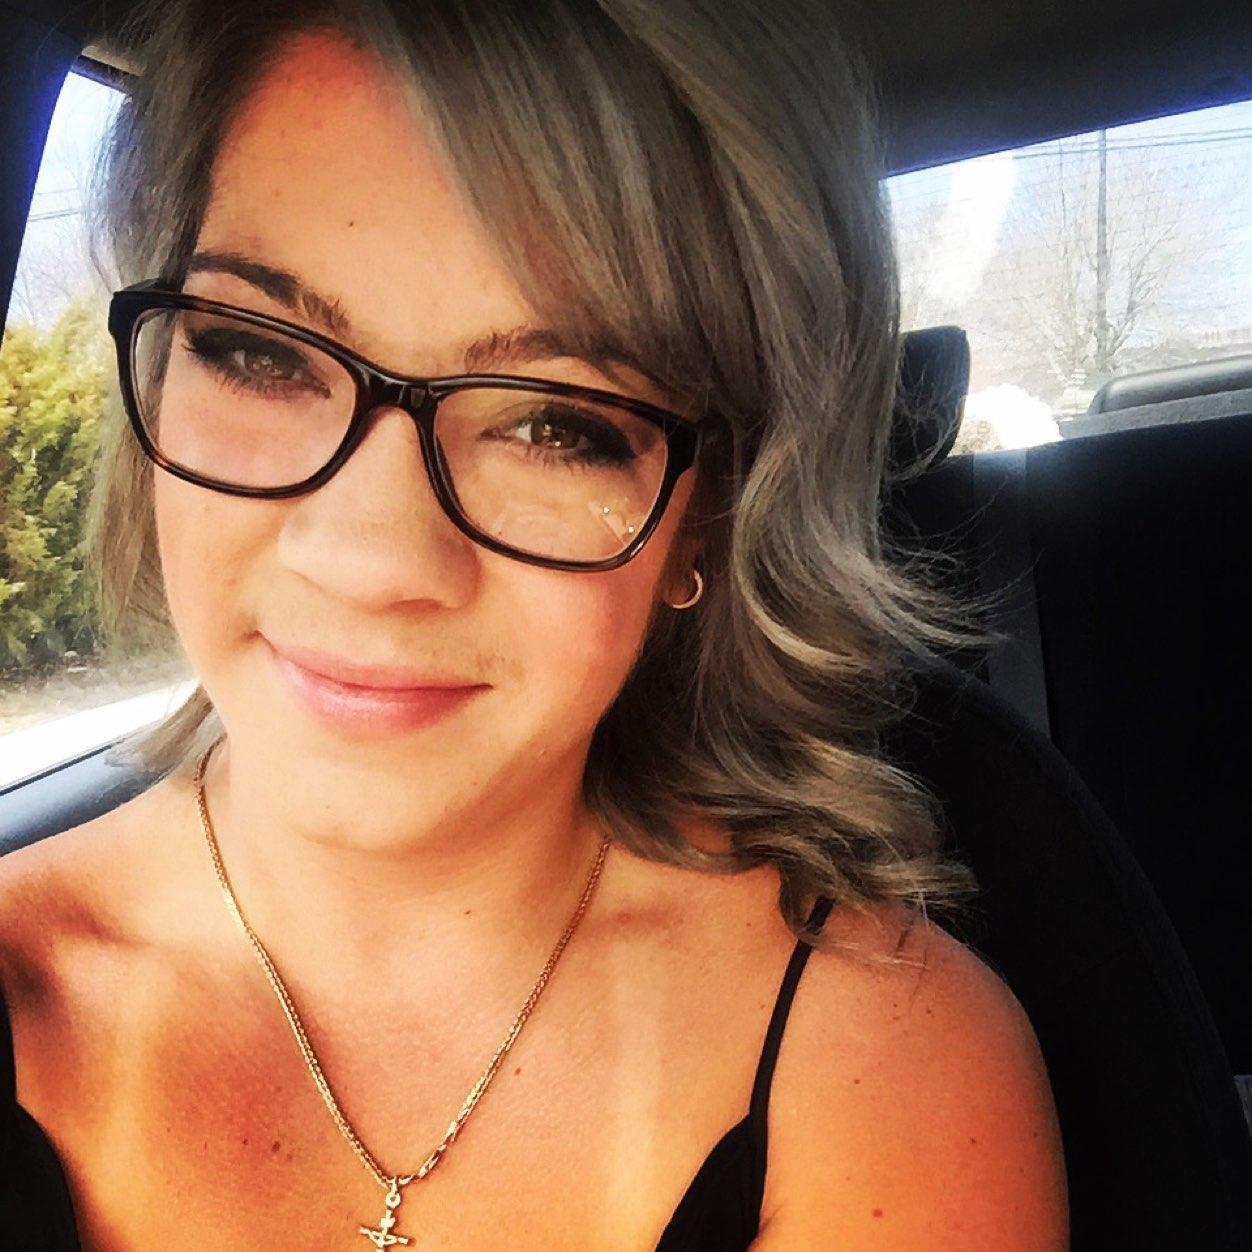 Haley McCormick